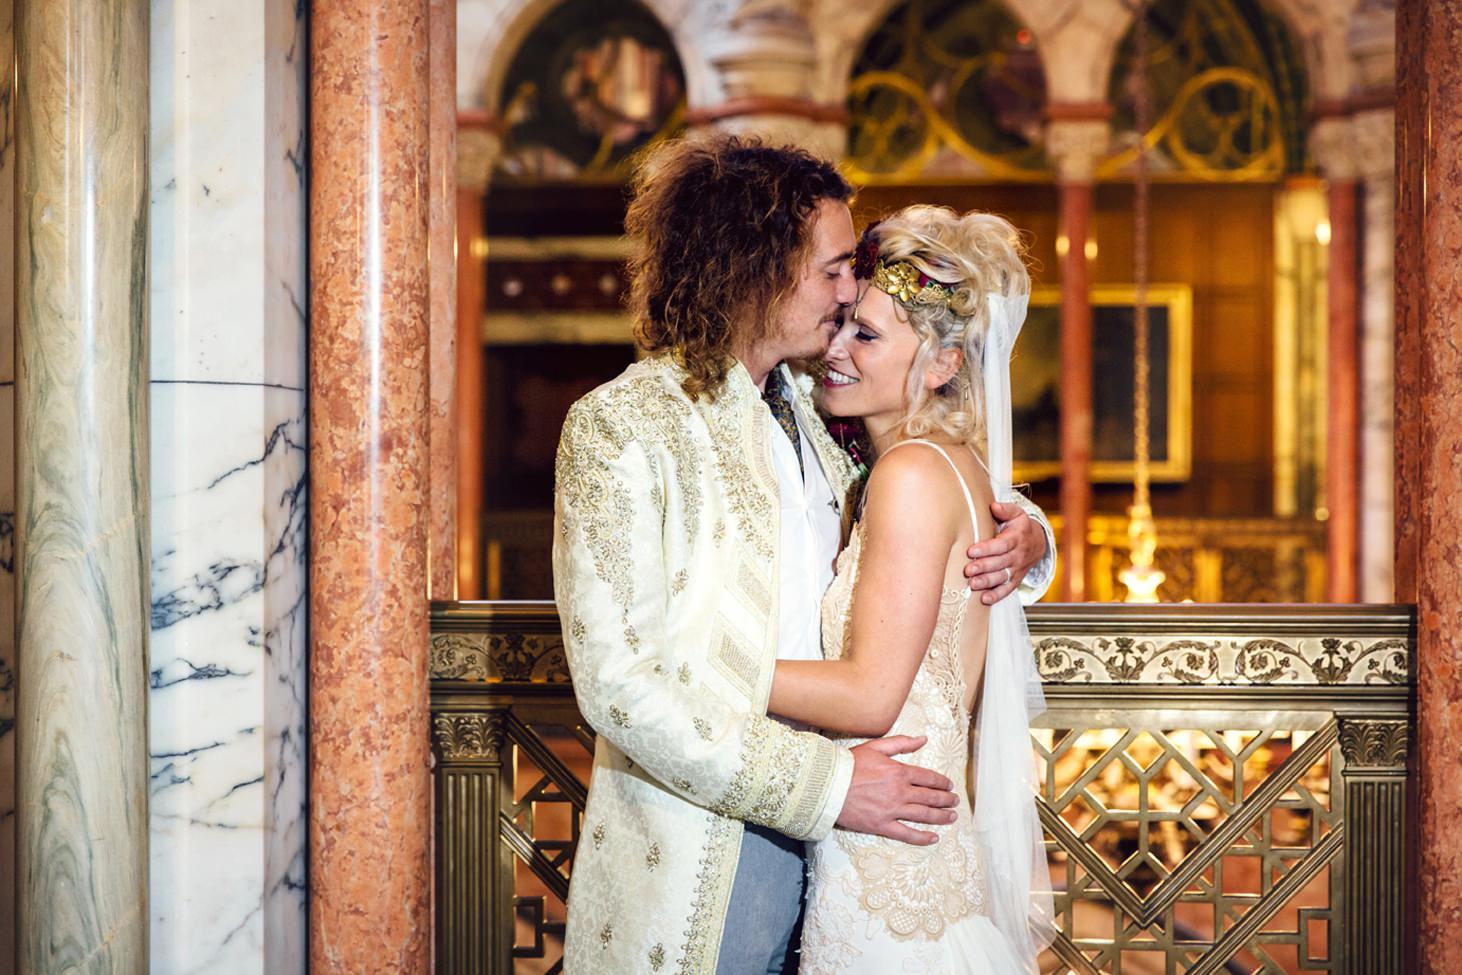 mount stuart wedding photography bride and groom marble hall portrait